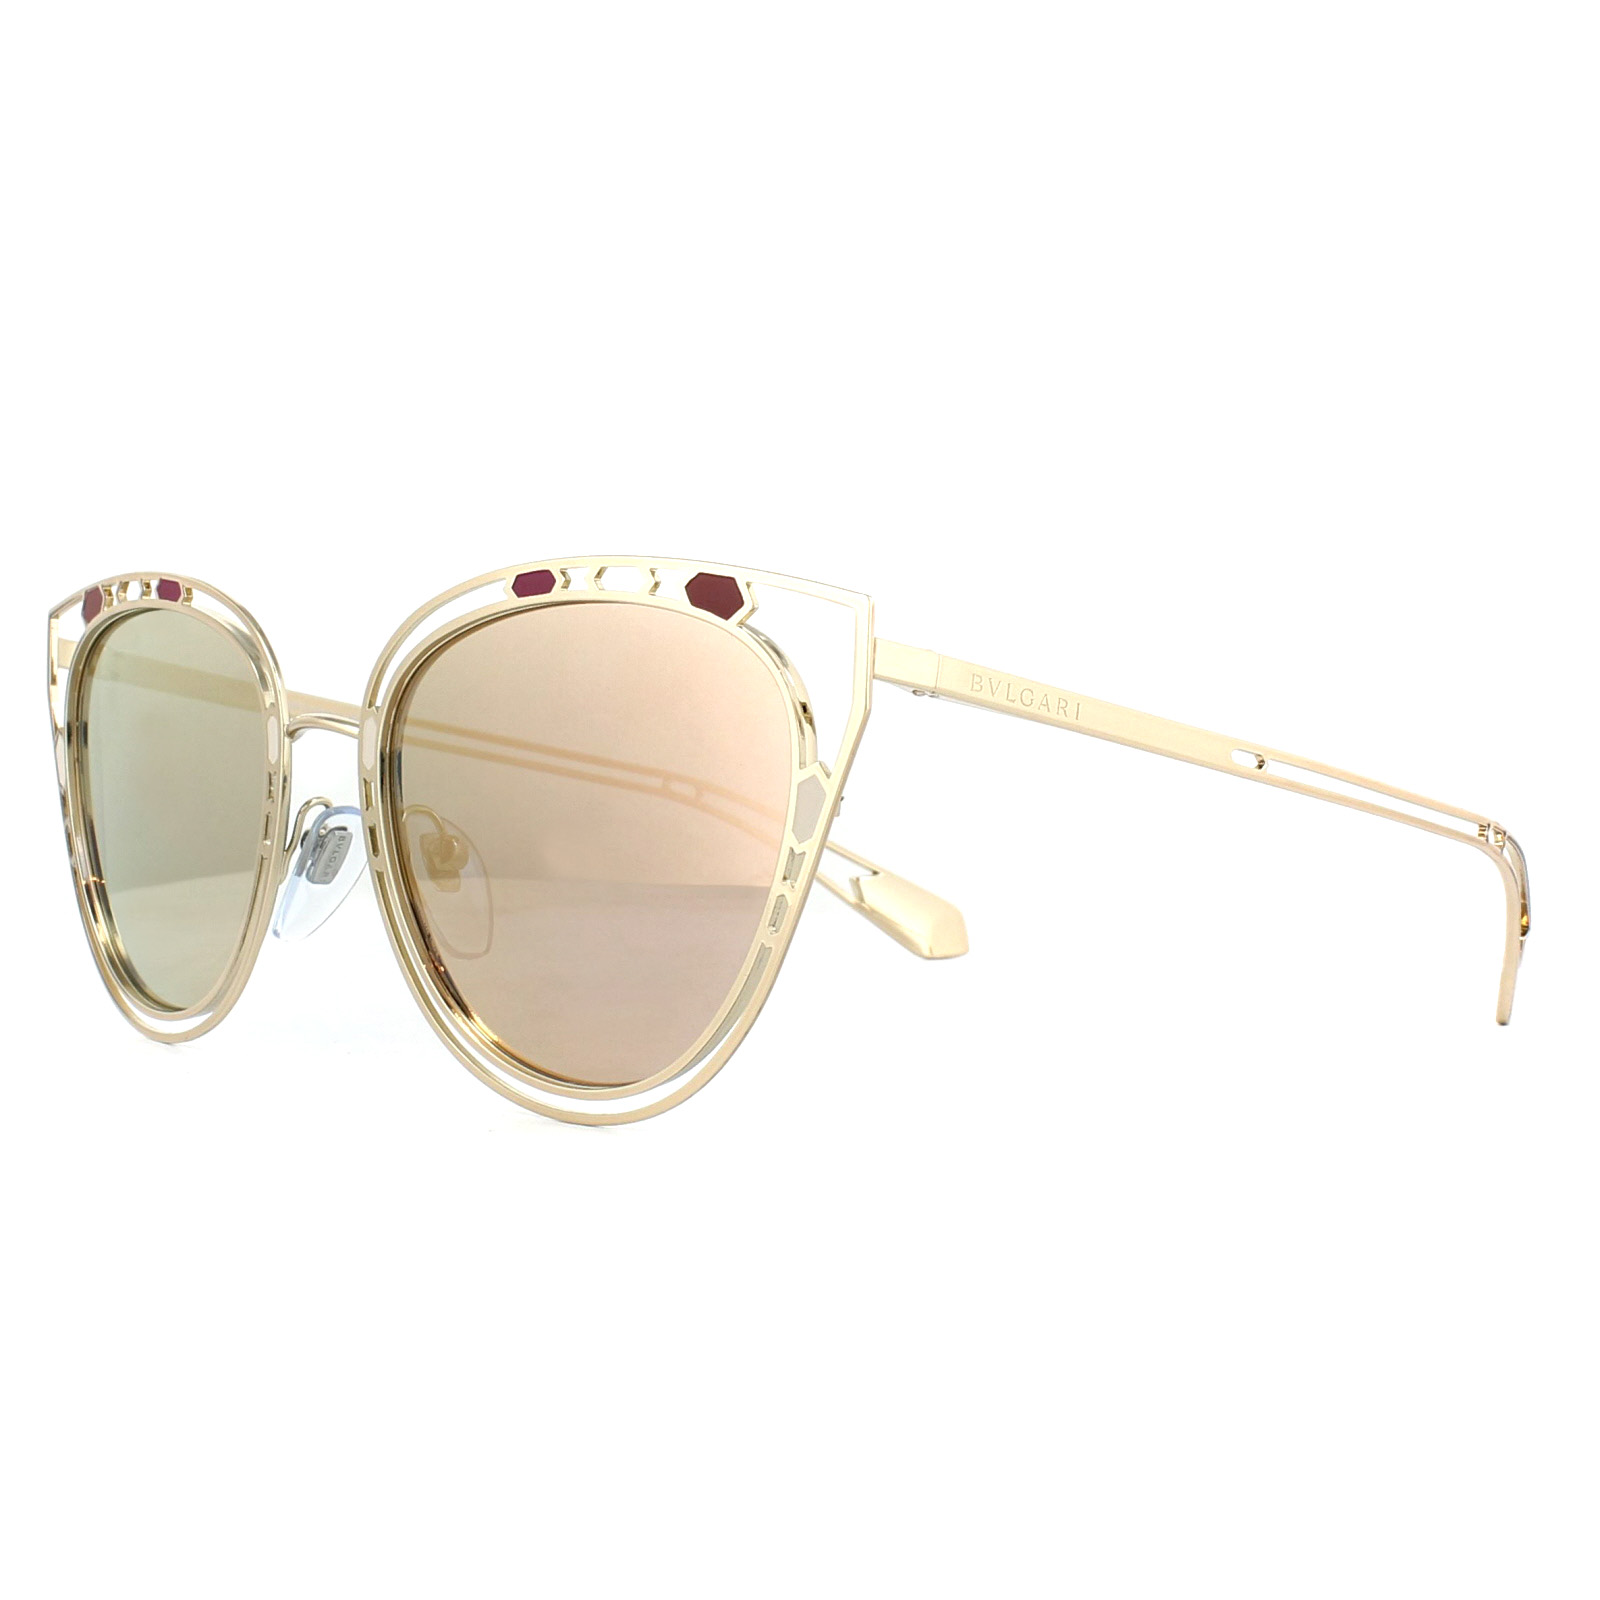 373536e325d Cheap Bvlgari BV6104 Sunglasses - Discounted Sunglasses